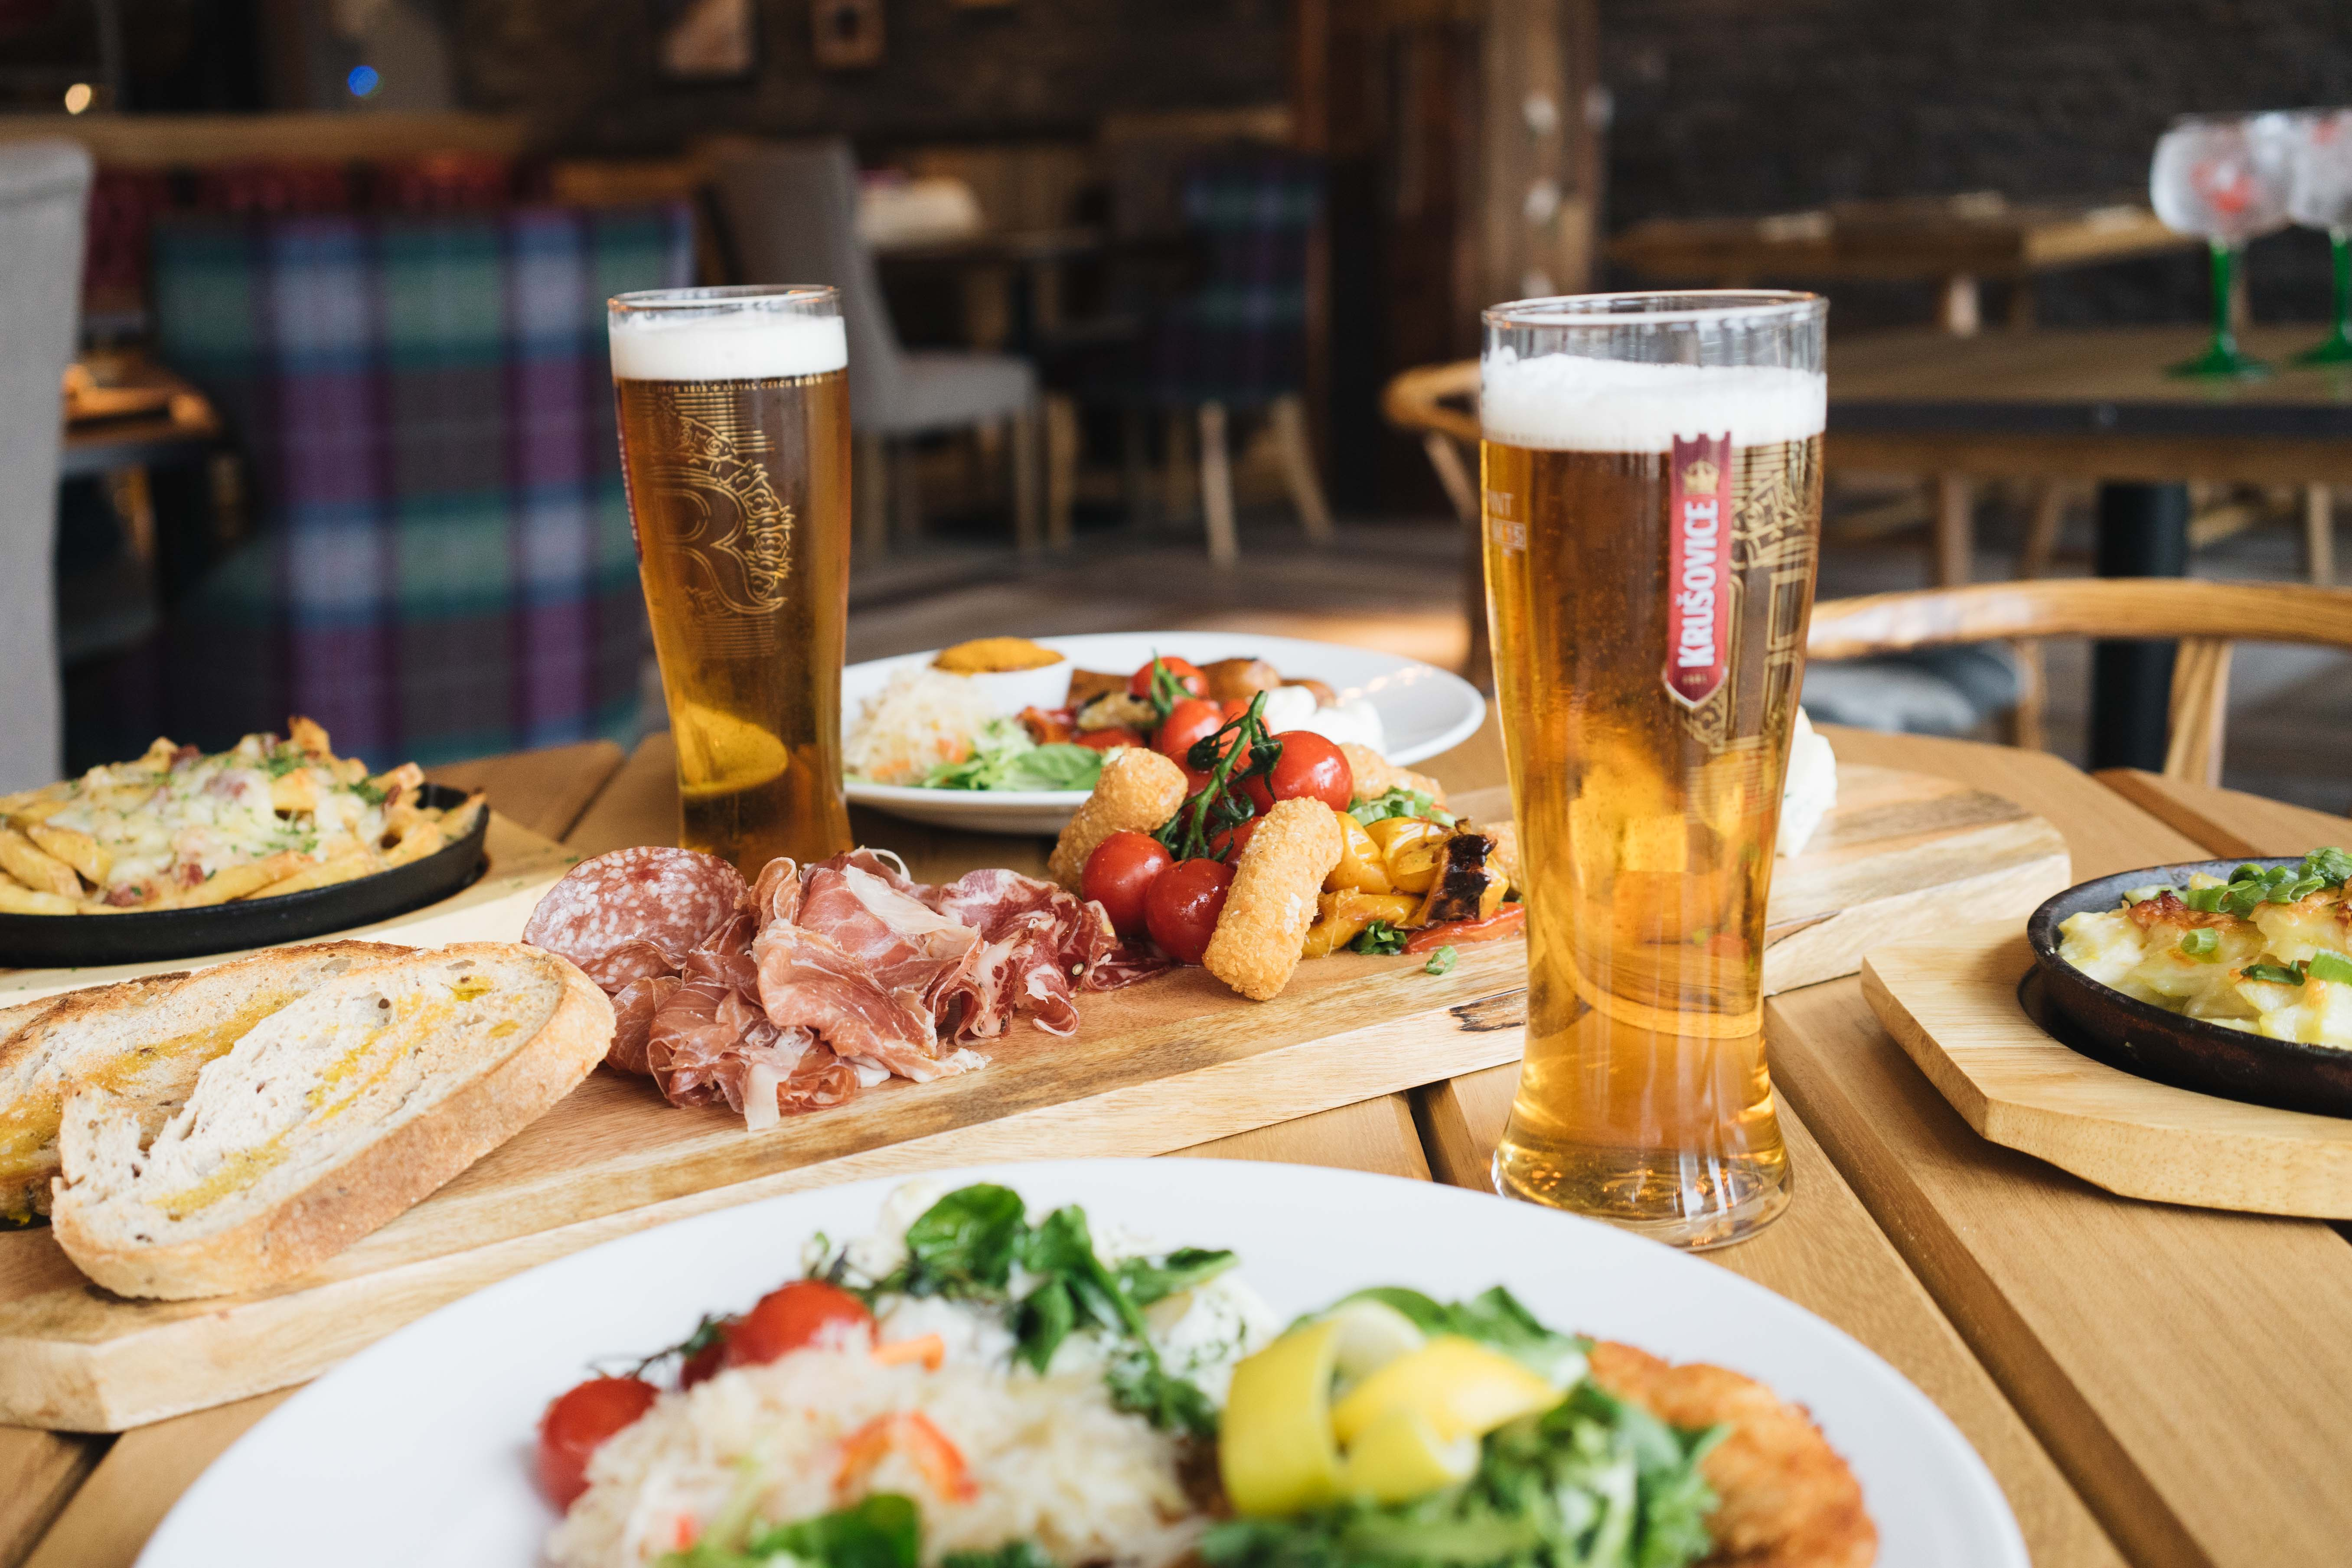 Antler Newcastle | Ski Chalet Bar | Food and Drink, Events & Karaoke Space | Launch Night | Elle Blonde Luxury Lifestyle Destination Blog